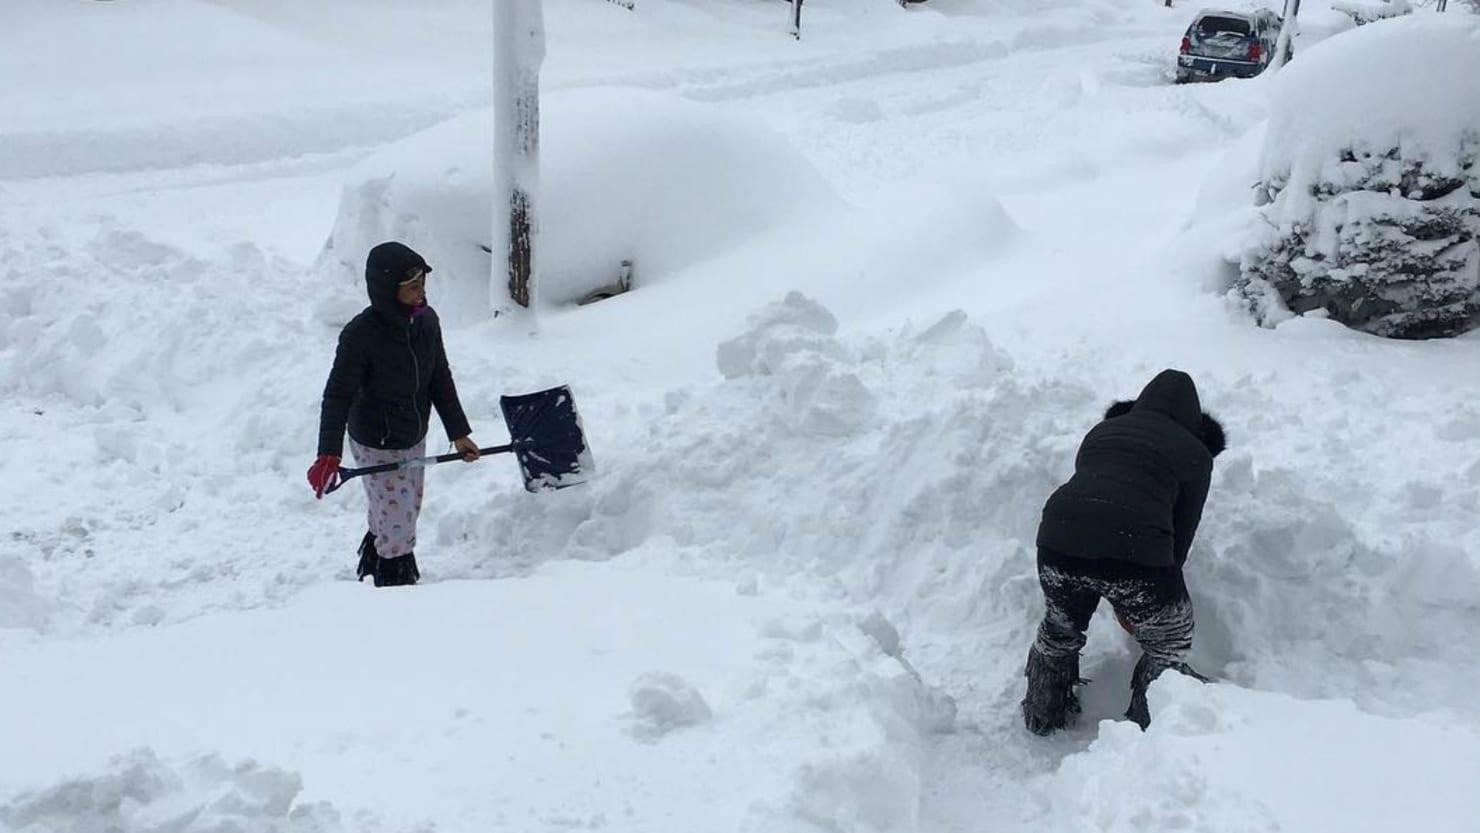 Erie Pennsylvania Battling Insane Snow Emergency